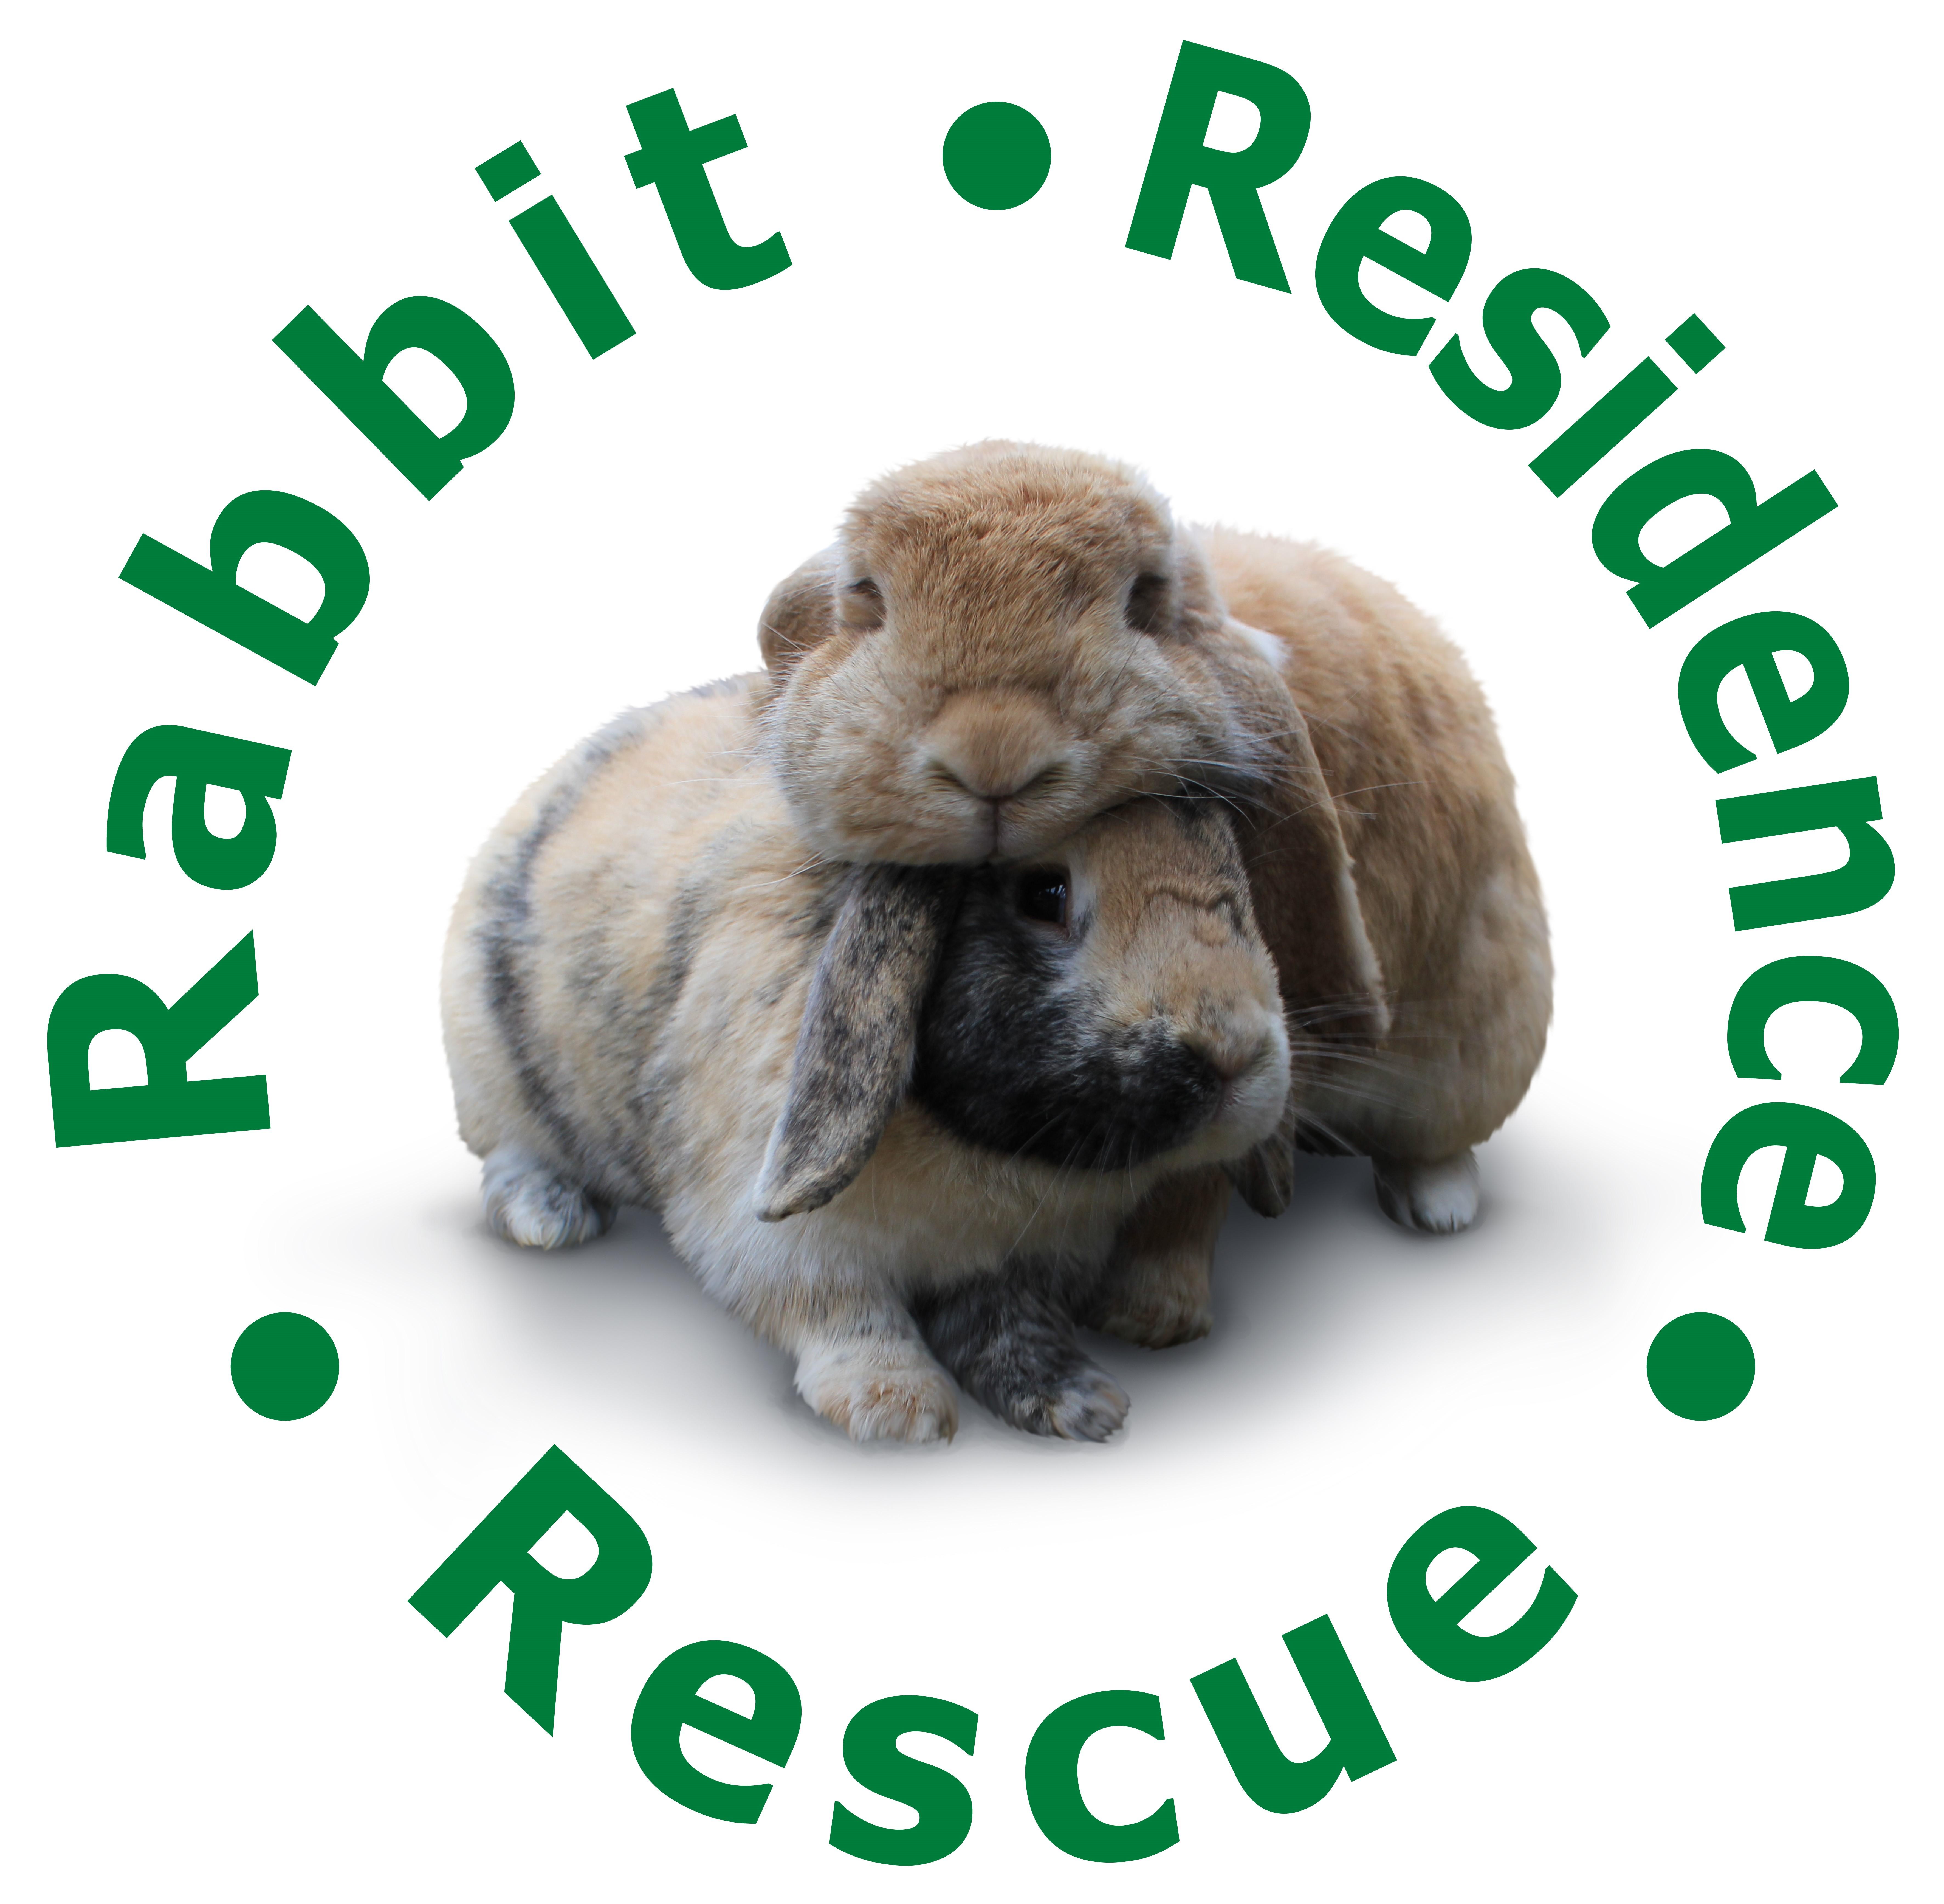 RABBIT RESIDENCE RESCUE